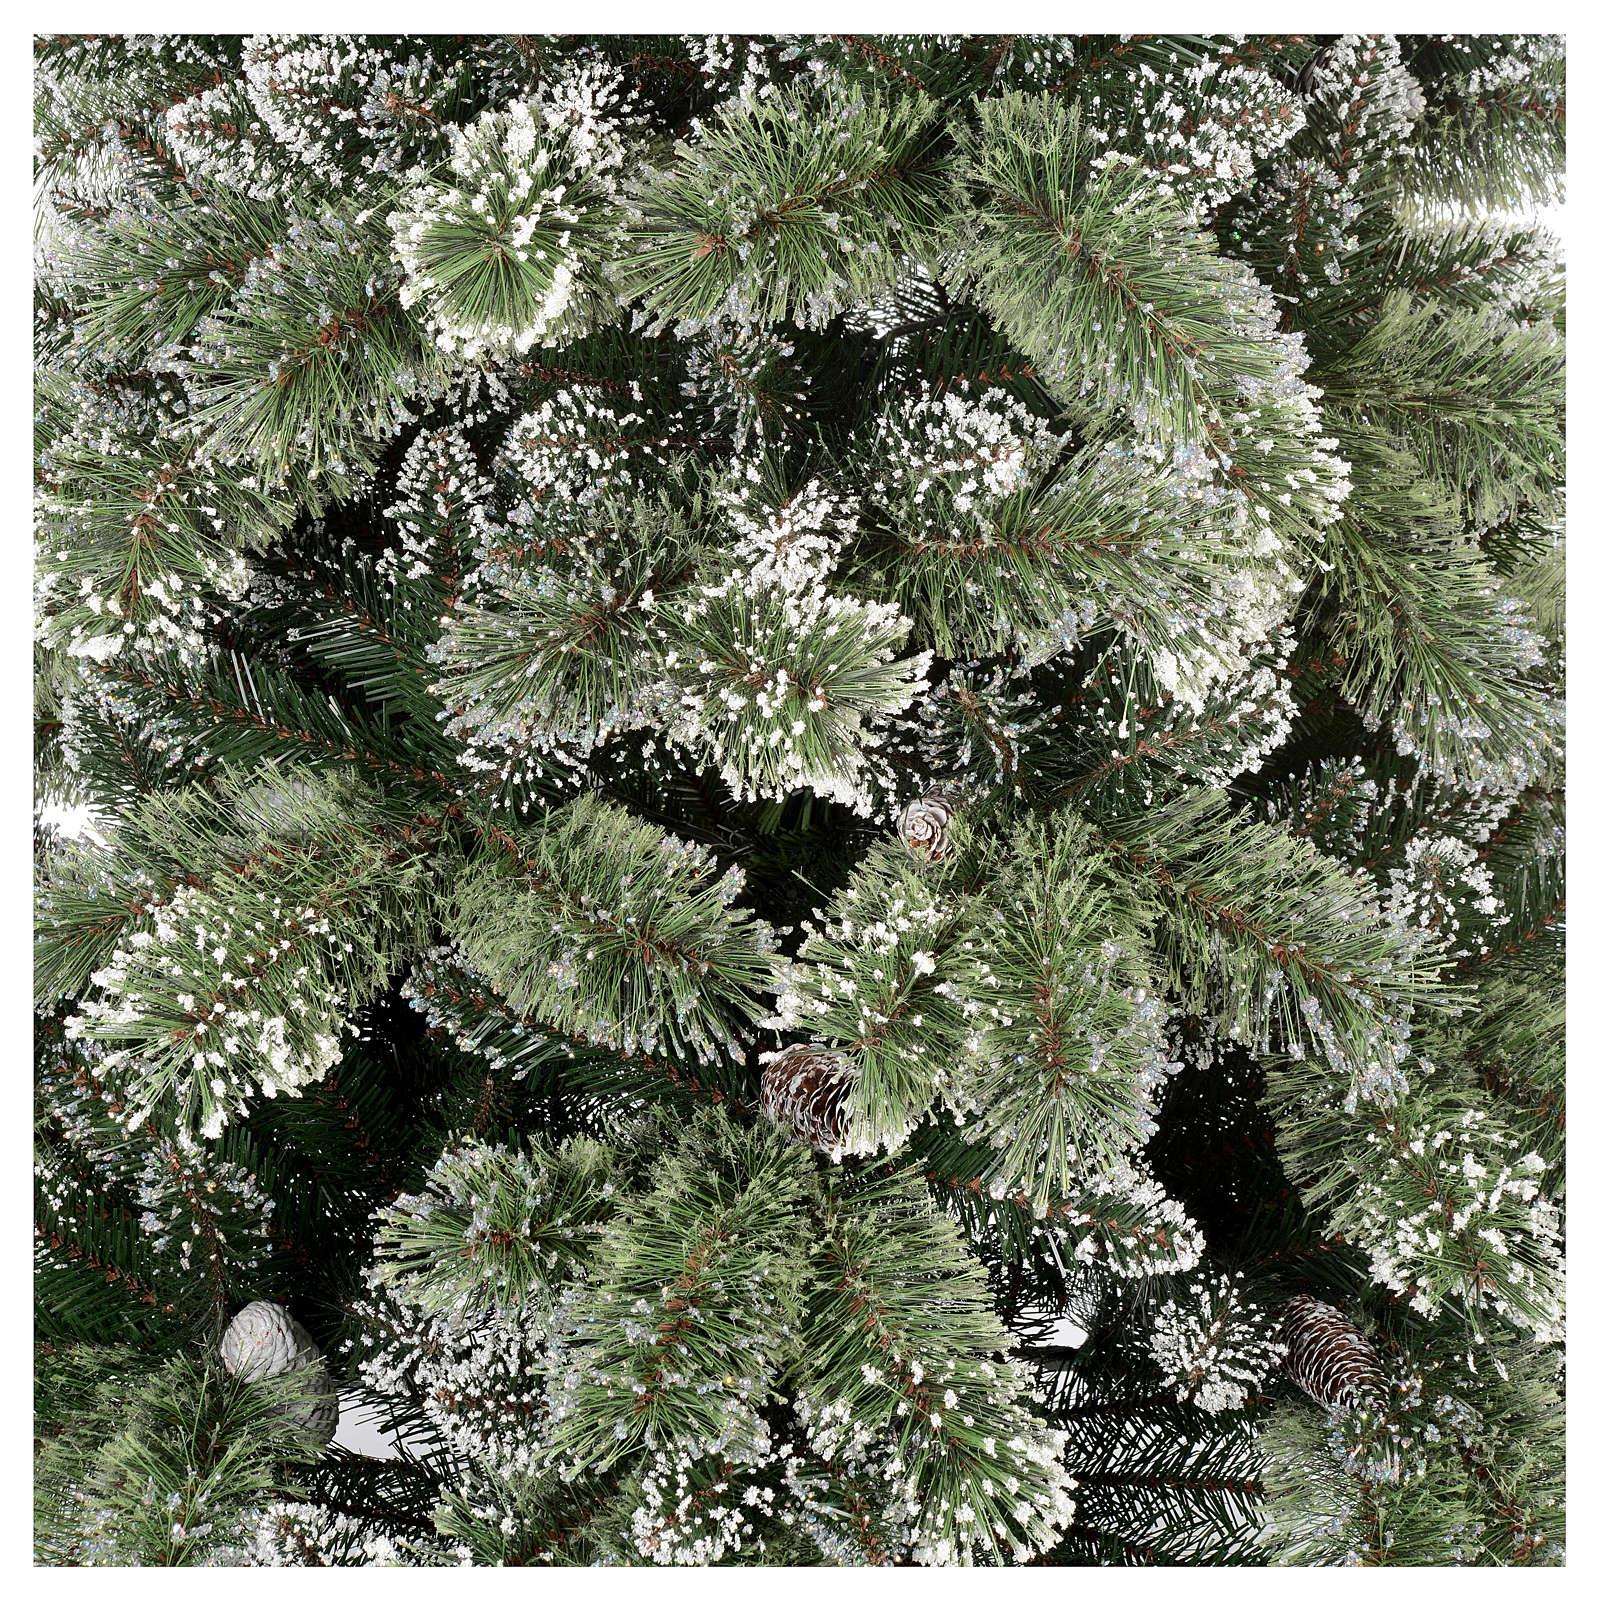 Sapin de Noël 180 cm vert pommes pin Glittery Bristle 3